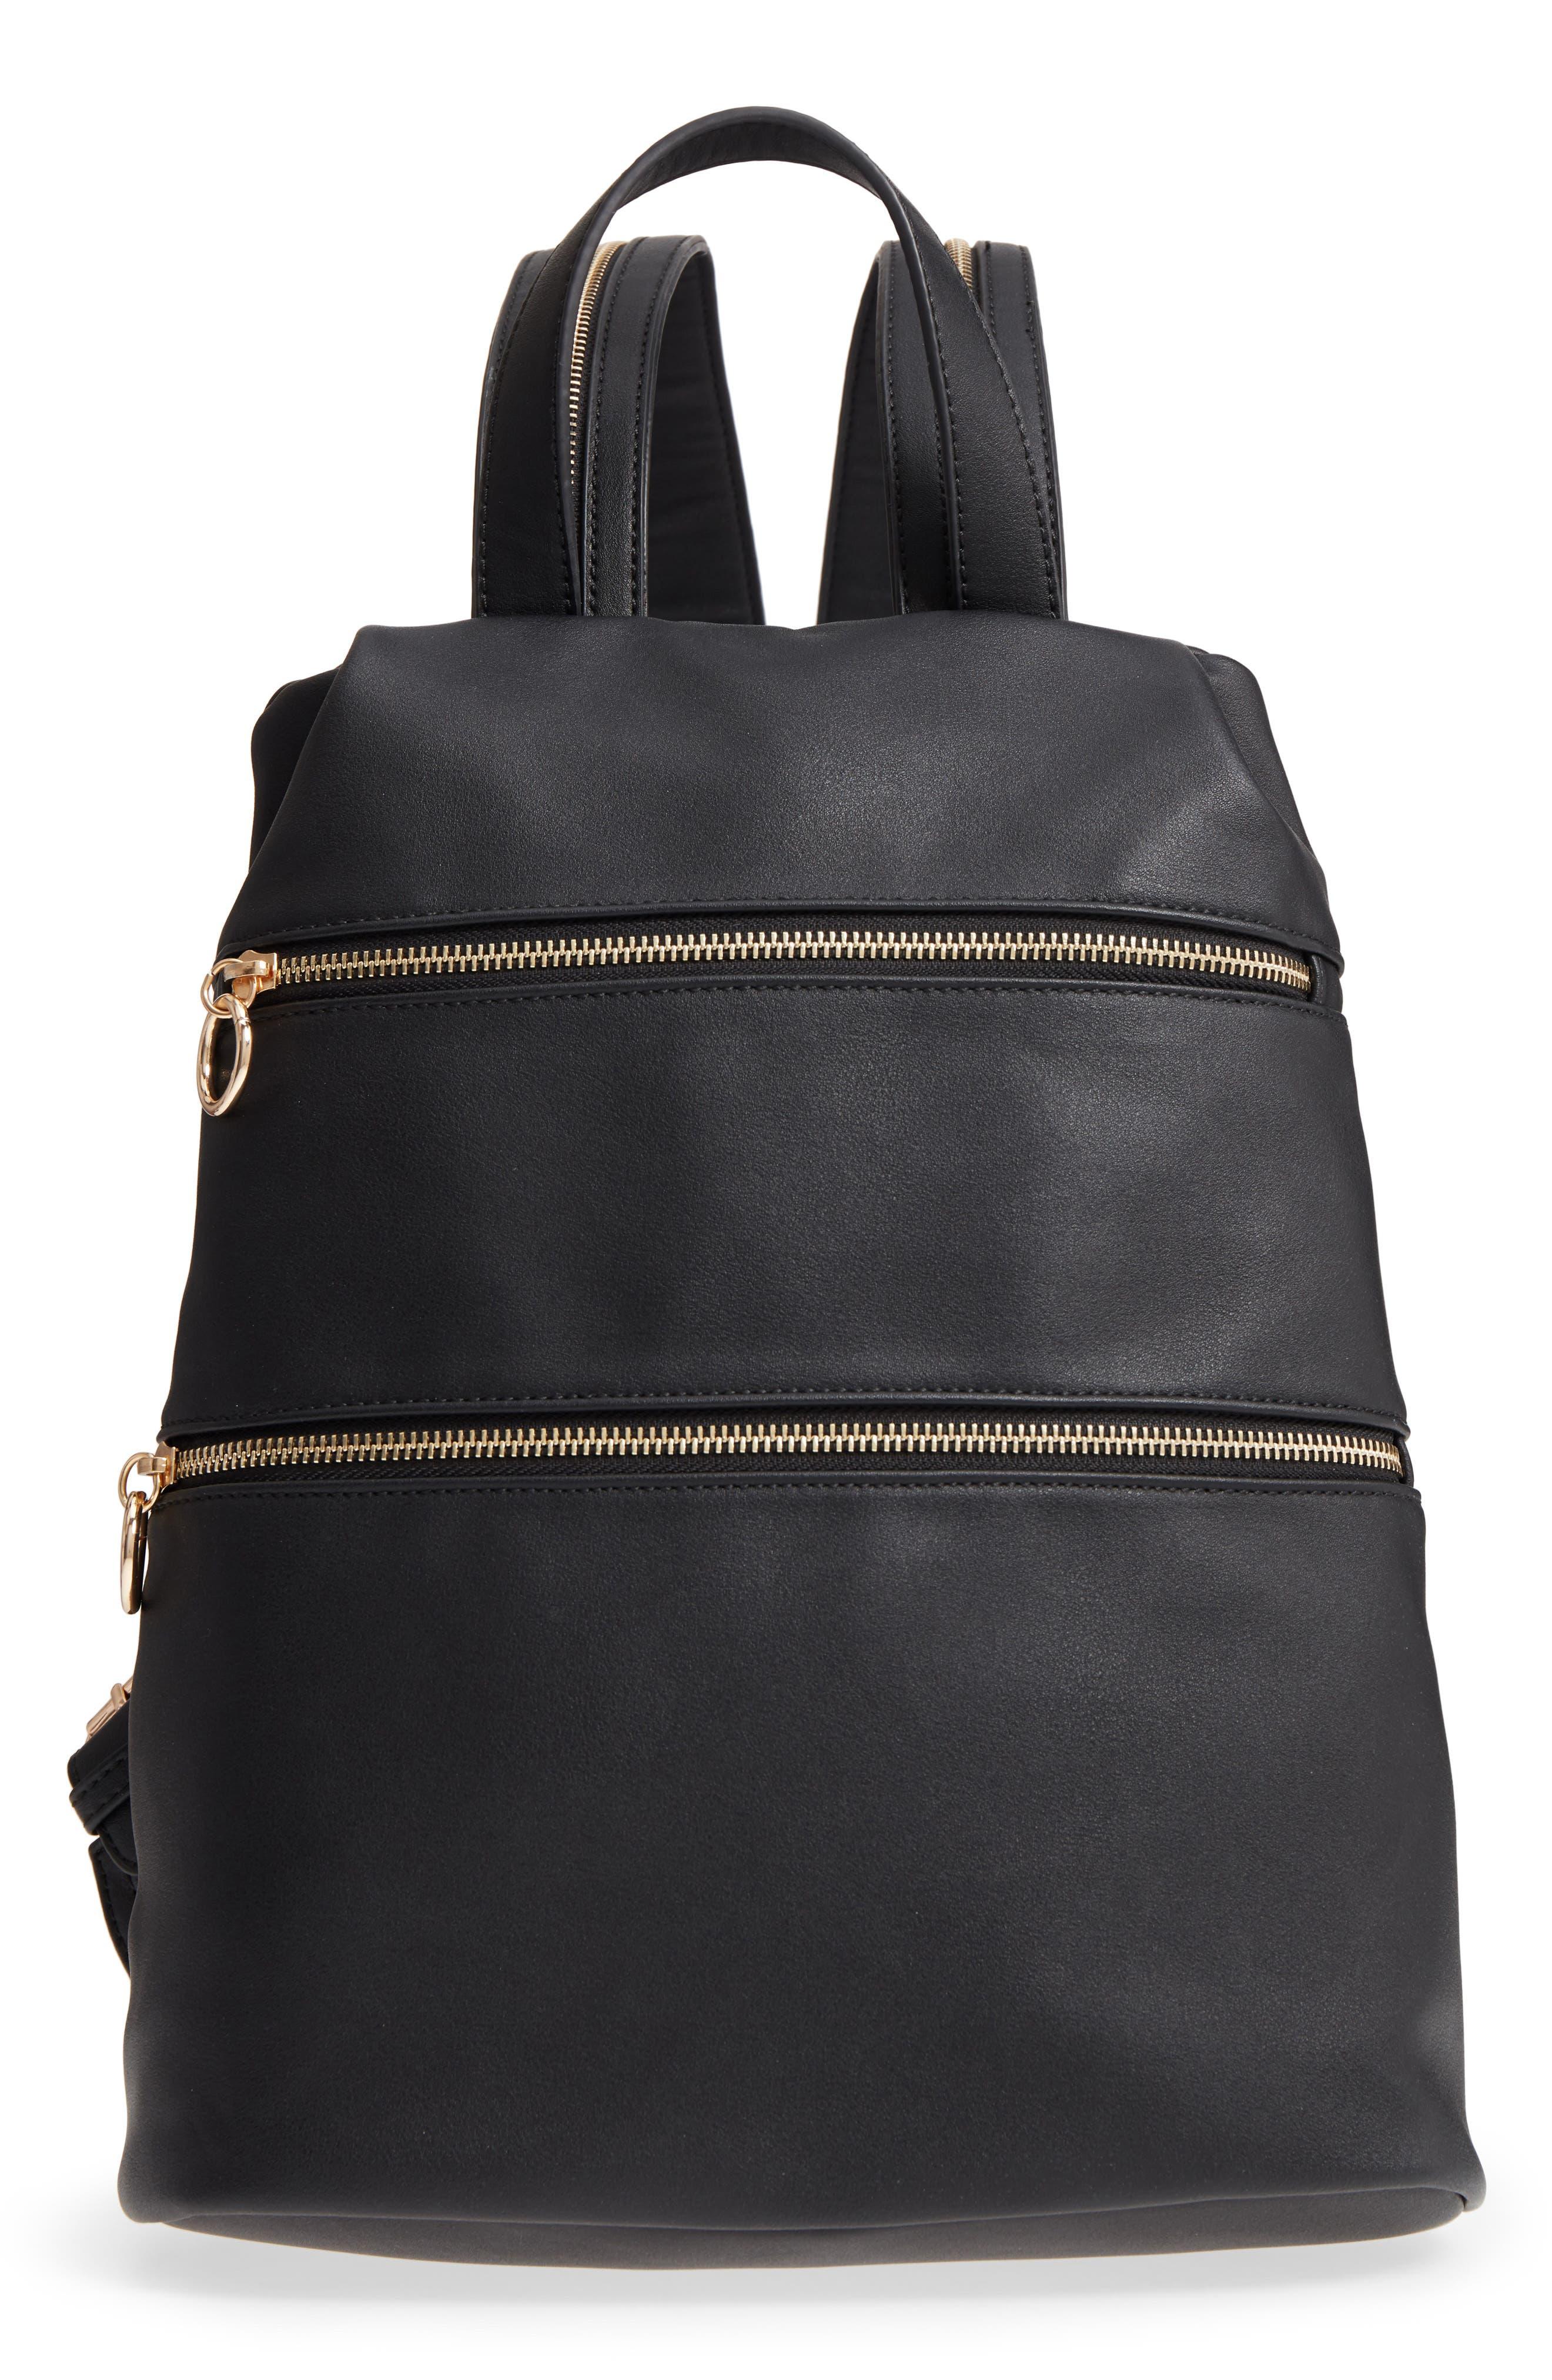 Malibu Skye Double Zip O Ring Faux Leather Backpack